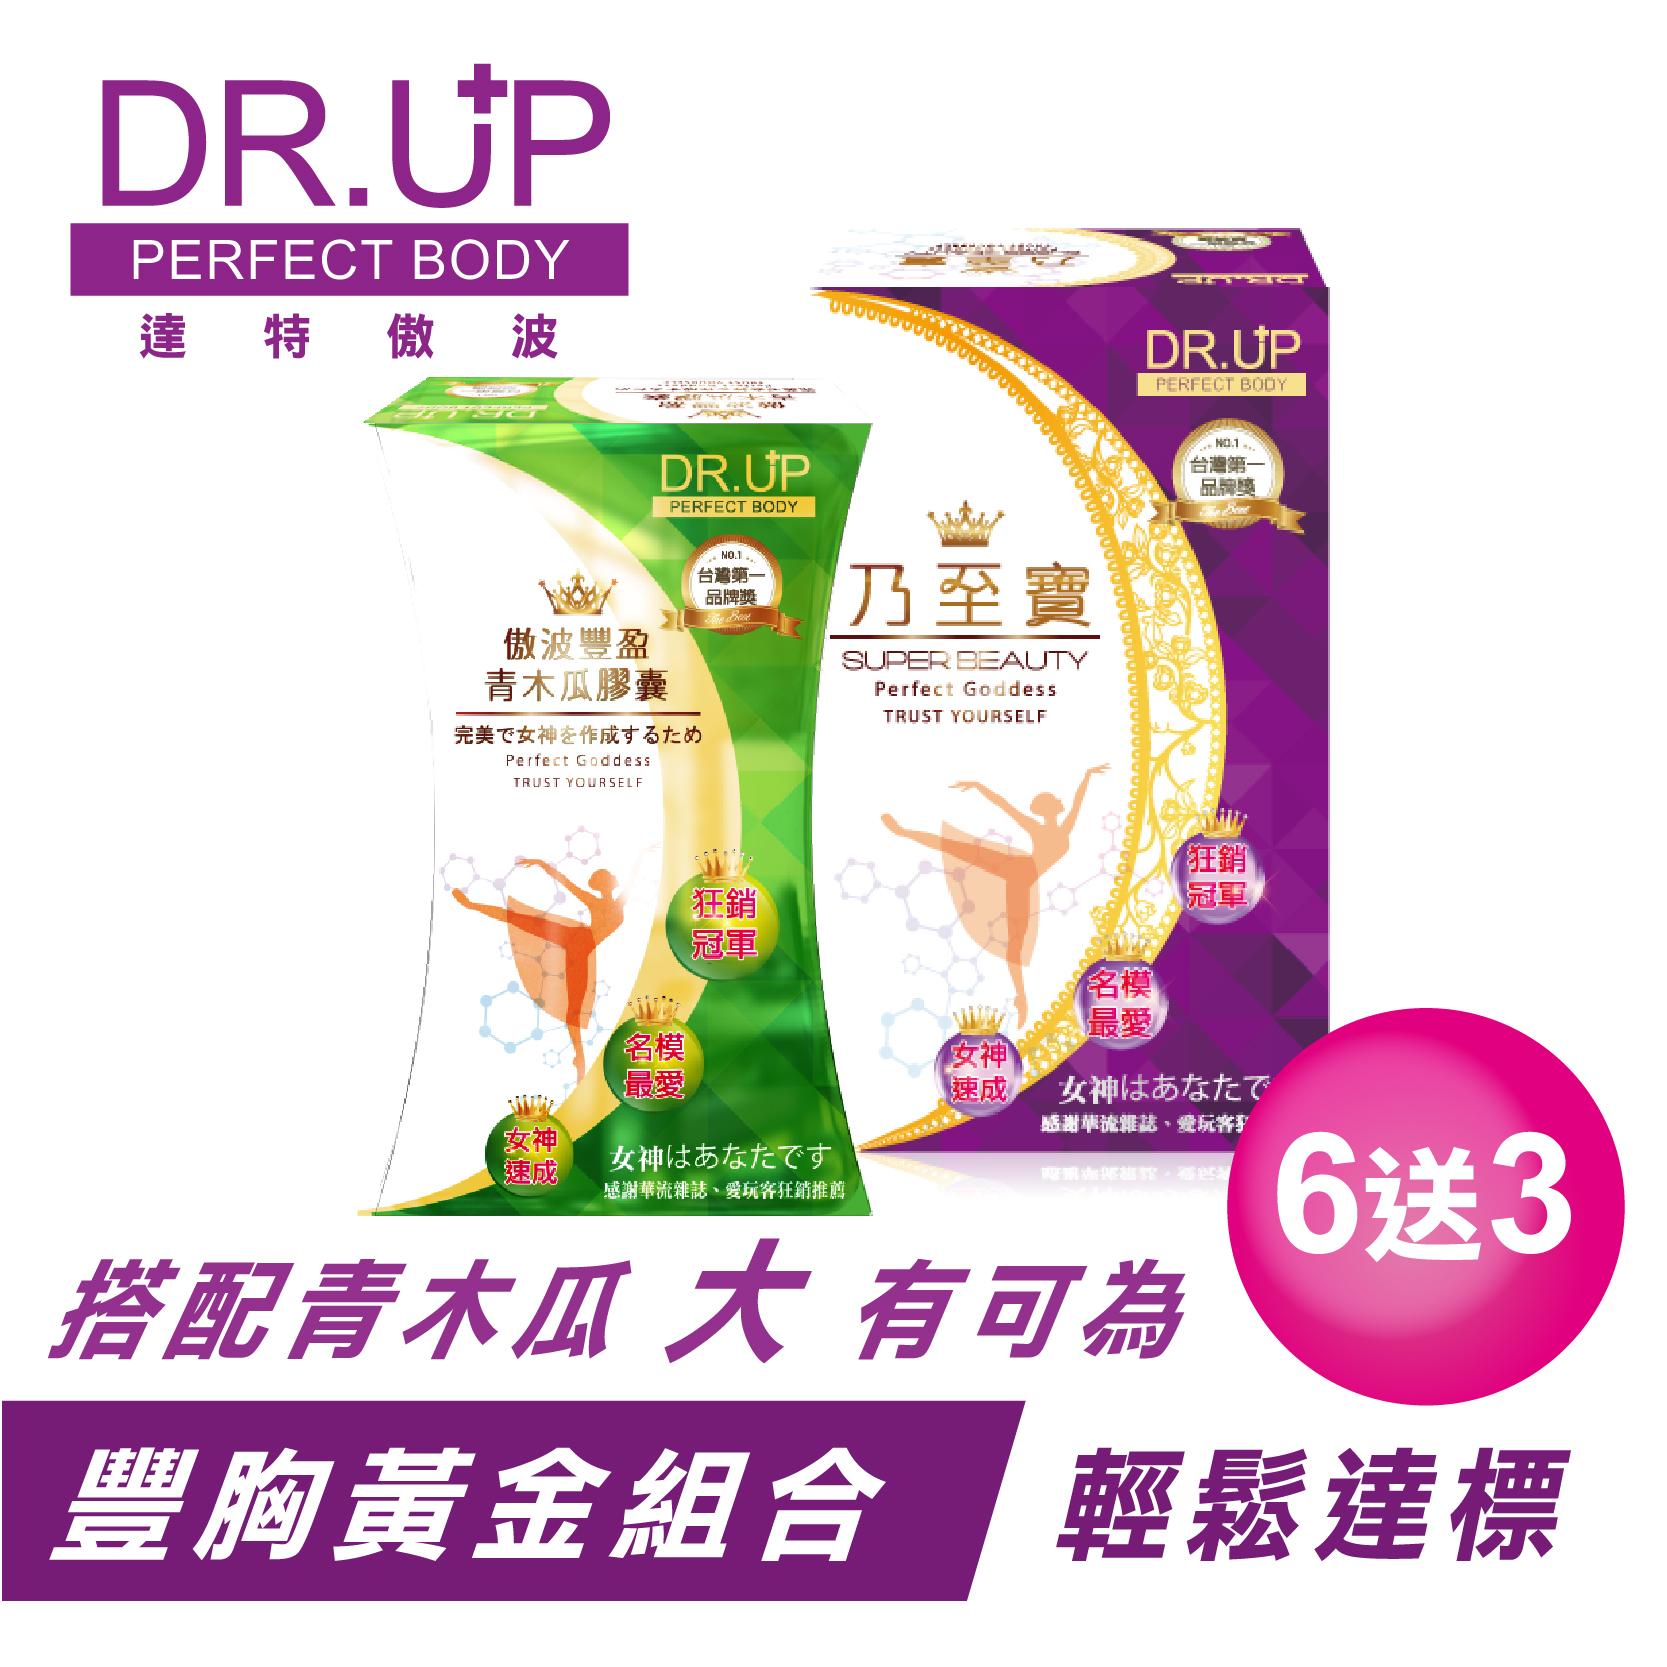 【DR.UP】乃至寶特濃第二代+青木瓜素食膠囊(6組)